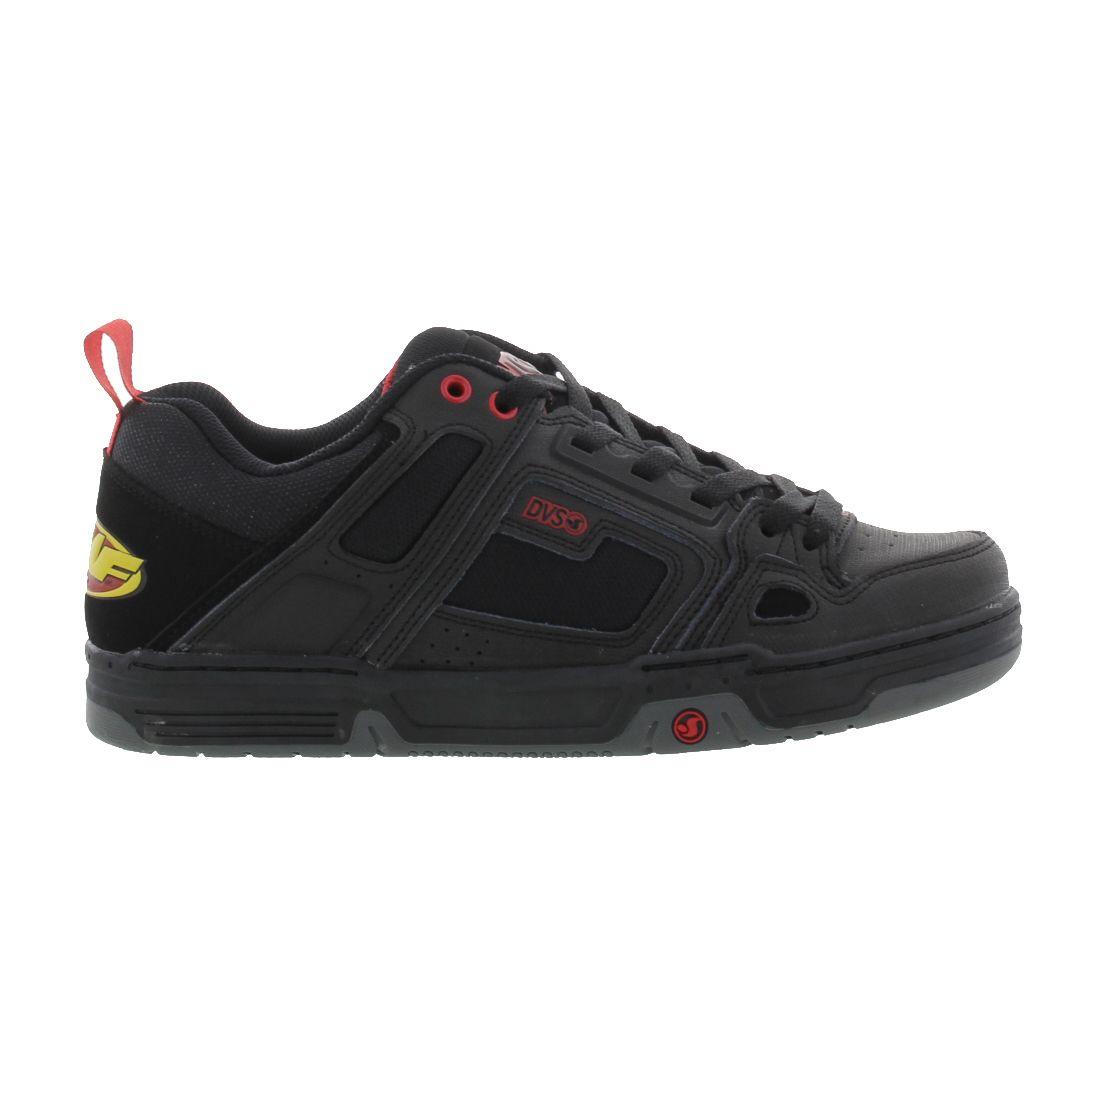 Hard Sole Black Walking Shoes